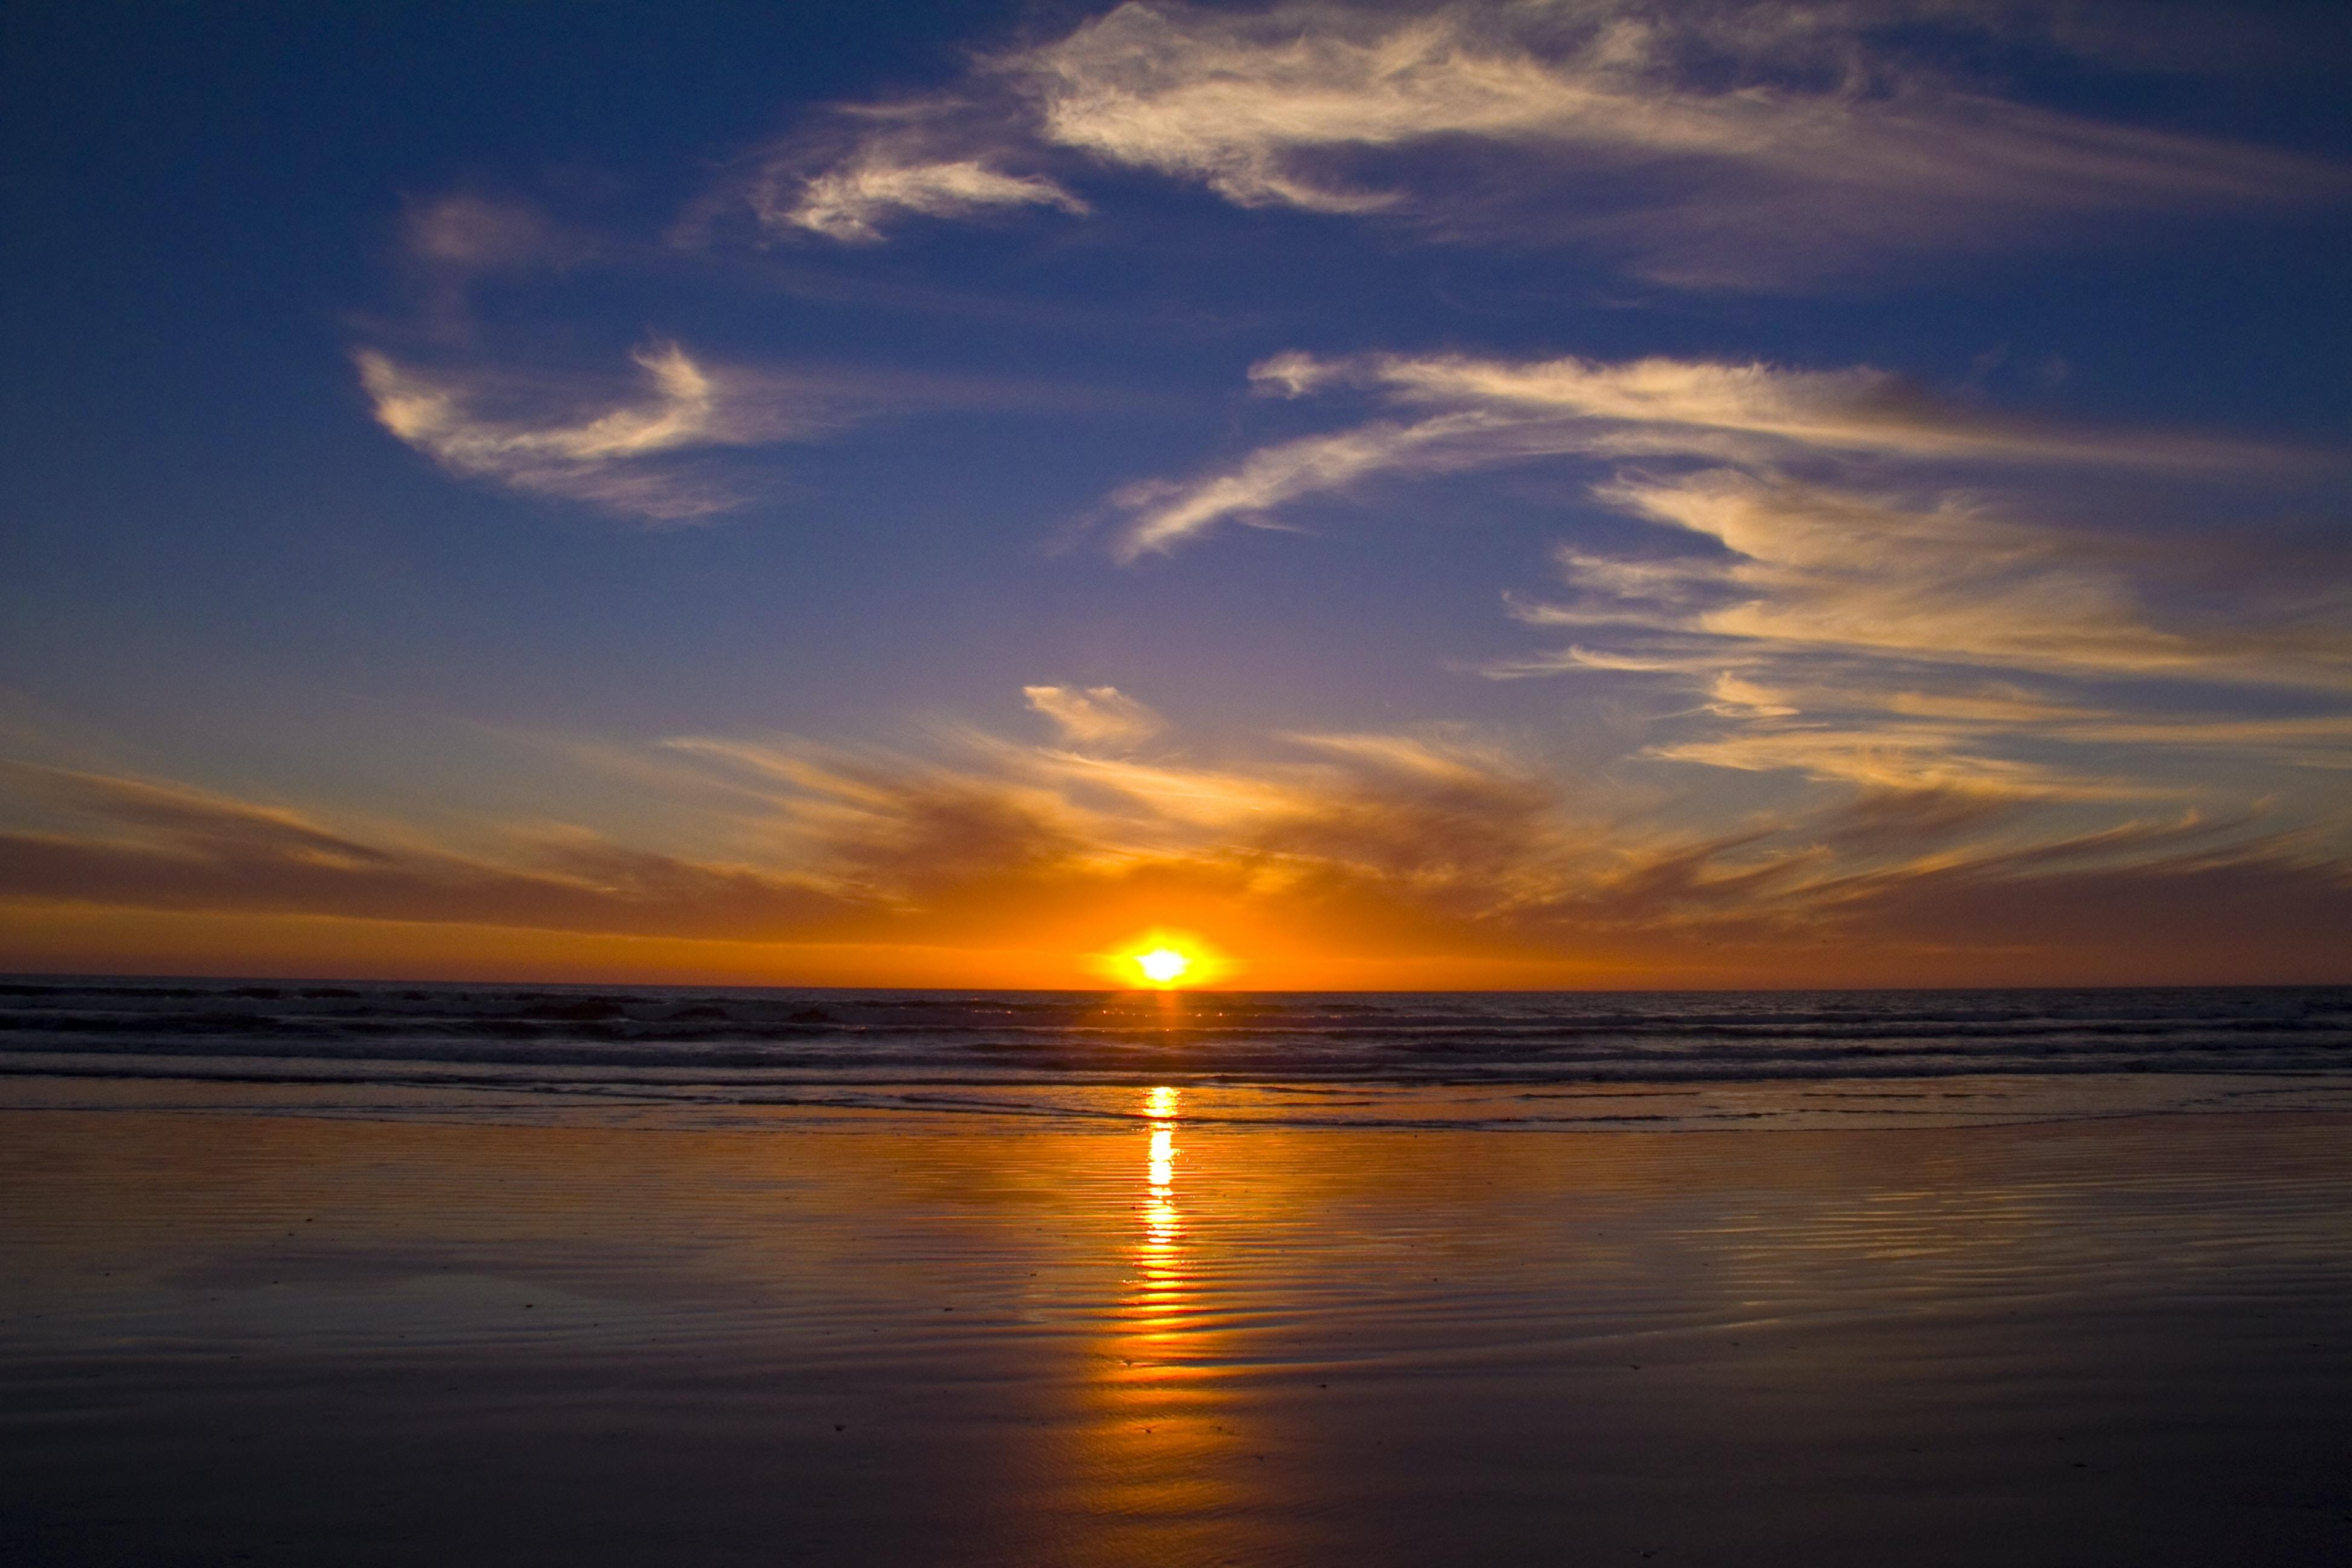 landscape photography of seashore during sunset